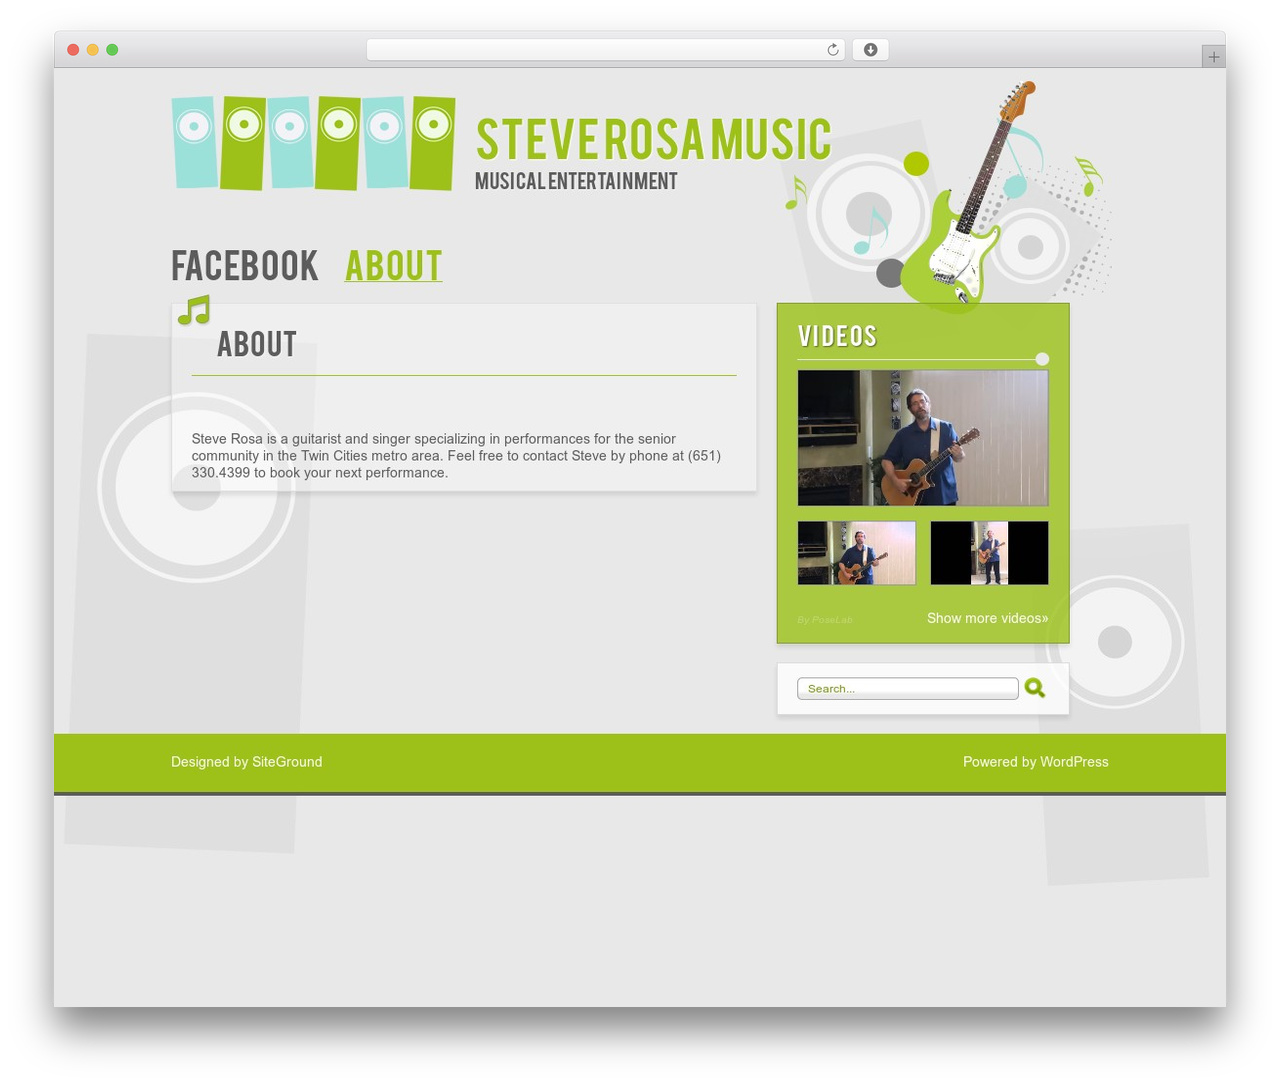 Music WordPress page template by Net-Labs - steverosamusic.org